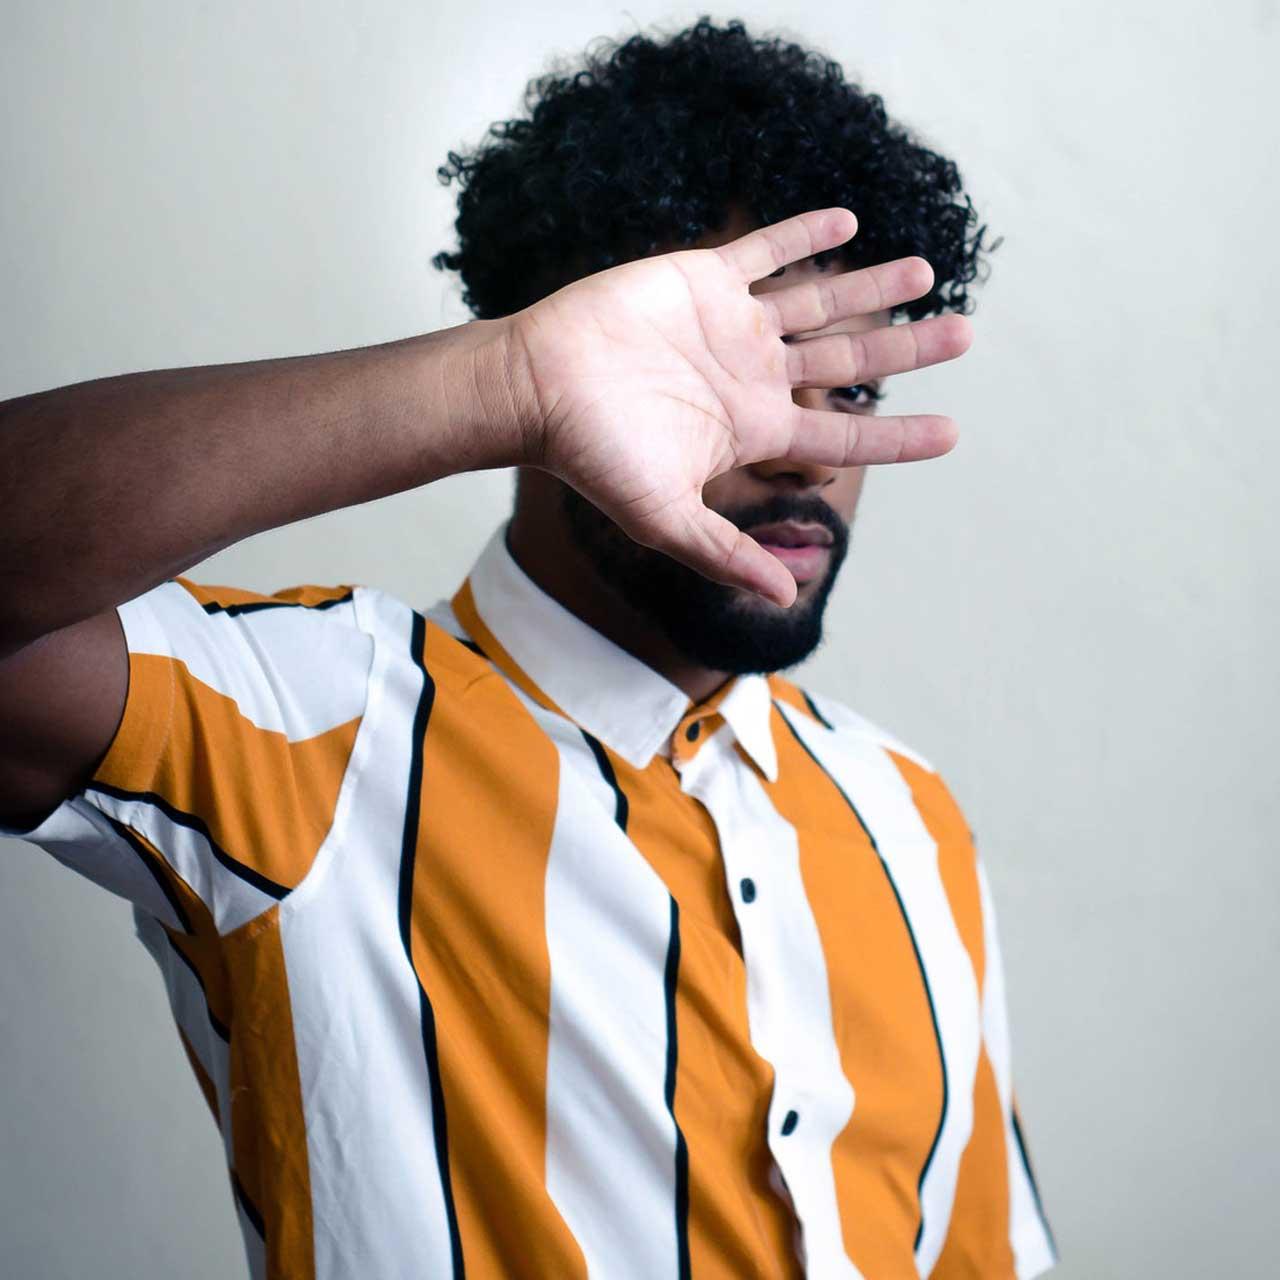 man-wearing-yellow-and-white-striped-shirt-3266351